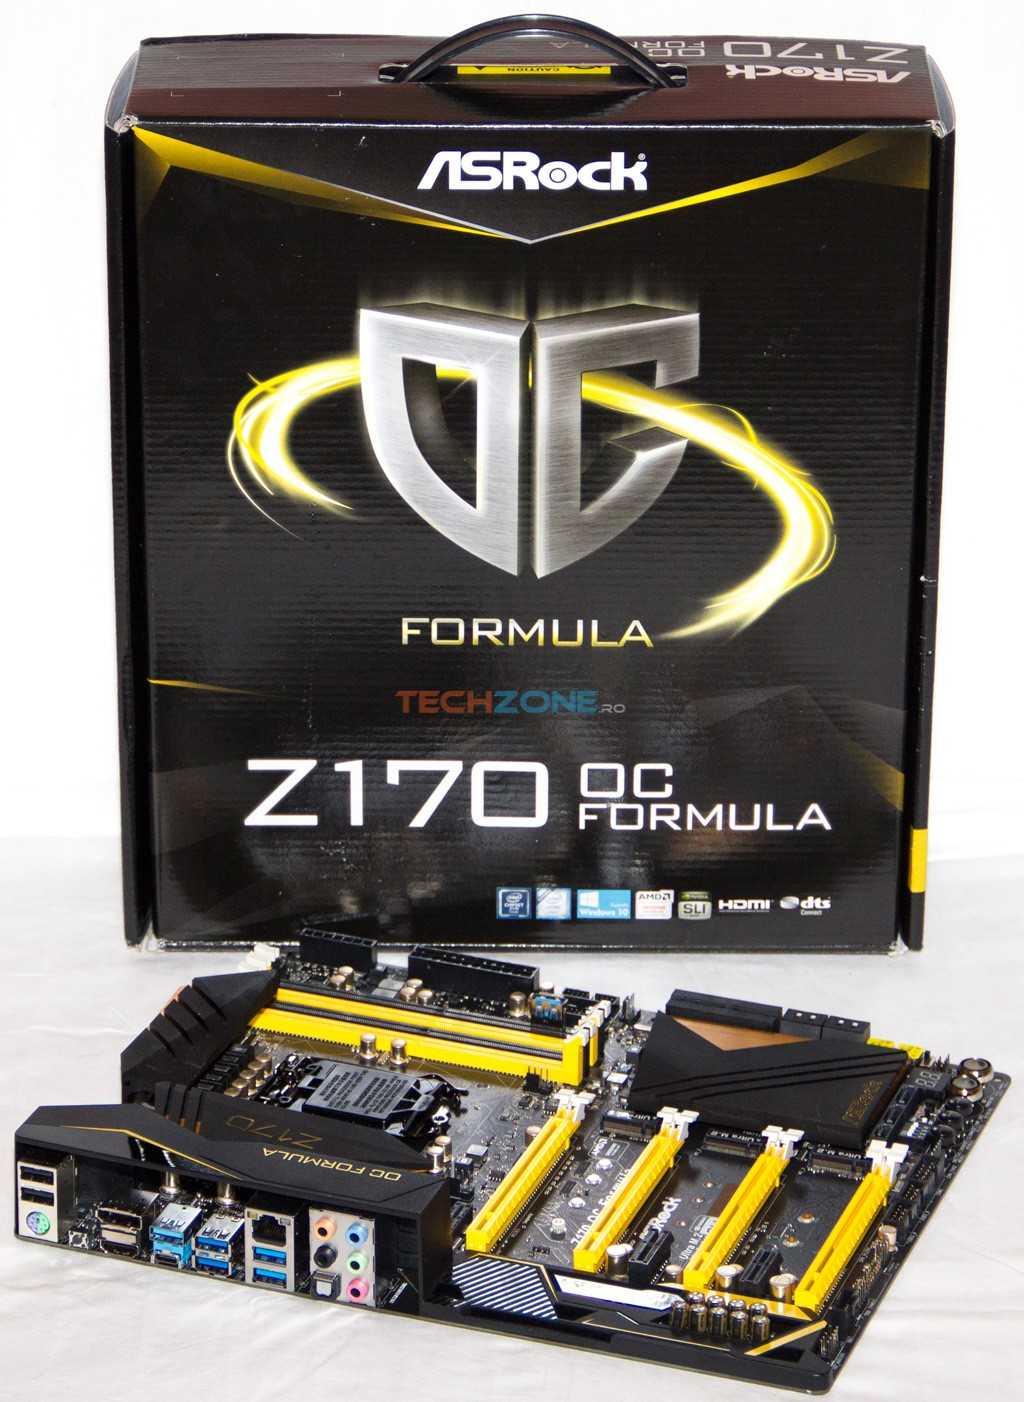 ASRock Z170 OC Formula set